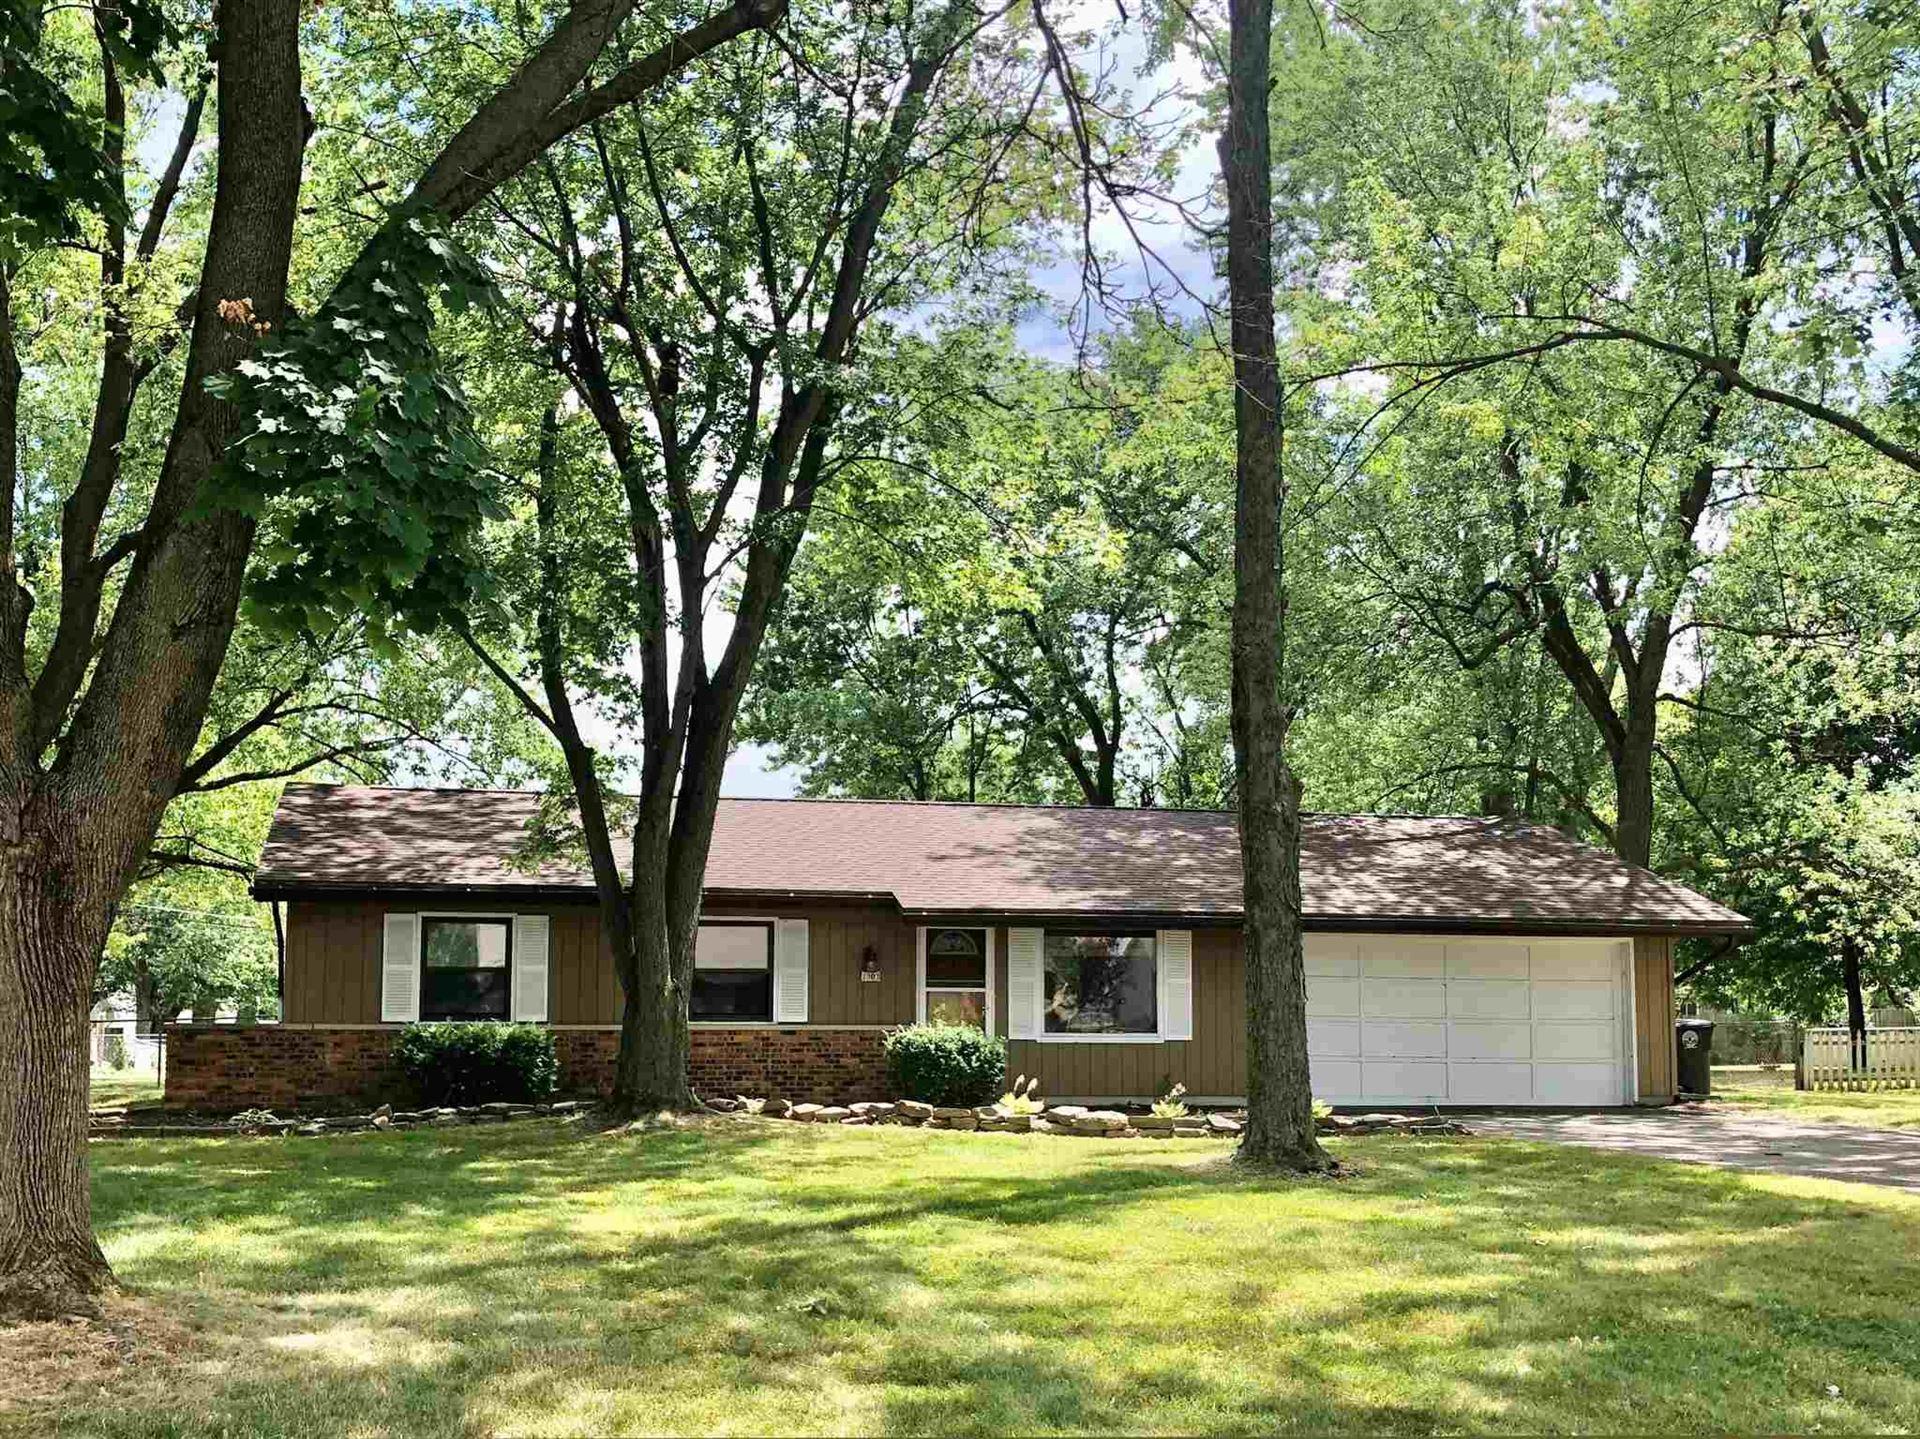 1503 Ludwig Park Drive, Fort Wayne, IN 46825 - #: 202026530